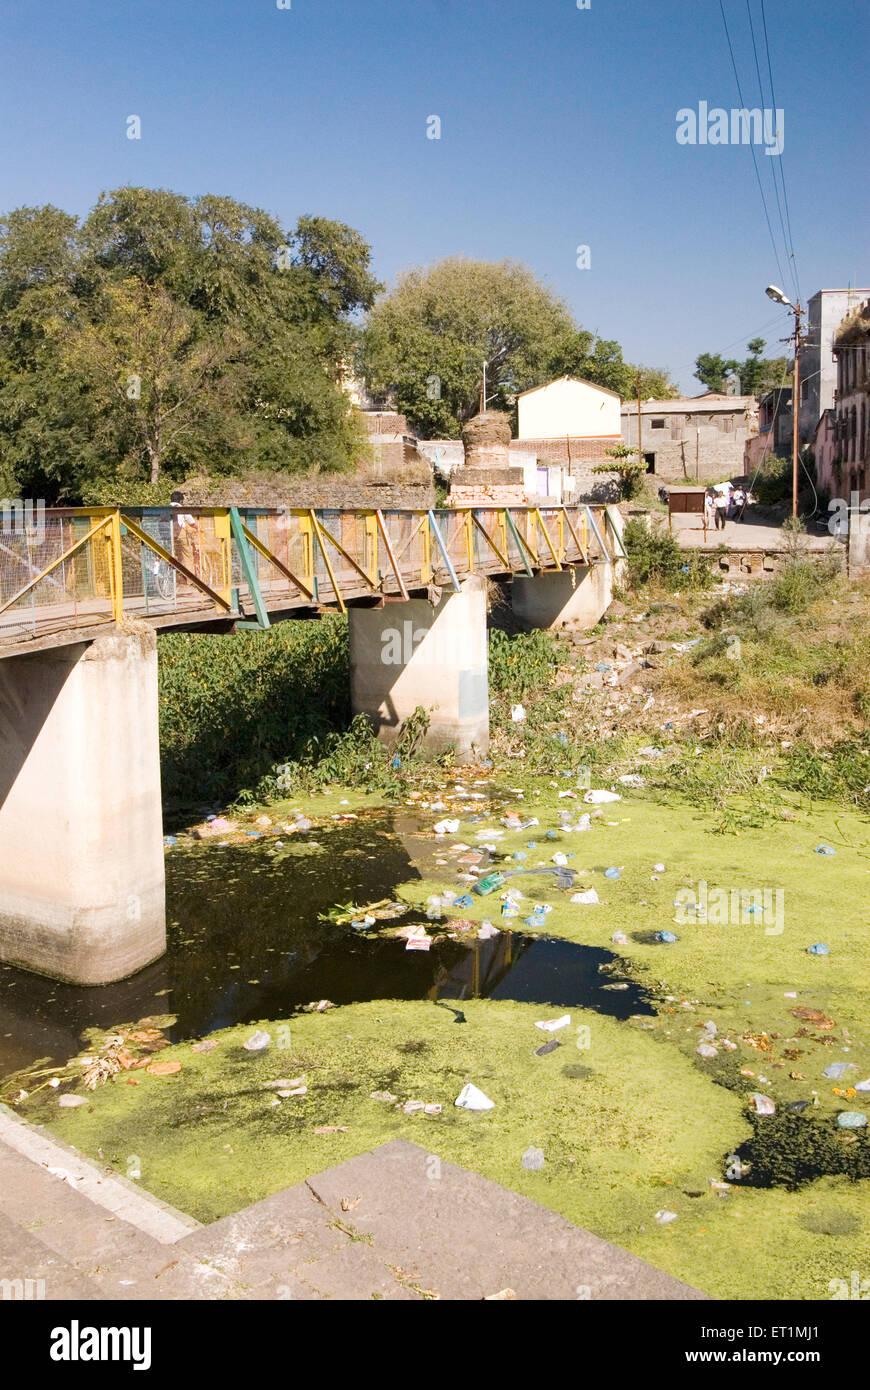 Pollution ; river turns into garbage dump ; people throw rubbish in river karh at Sasvad village ; taluka Purandar - Stock Image